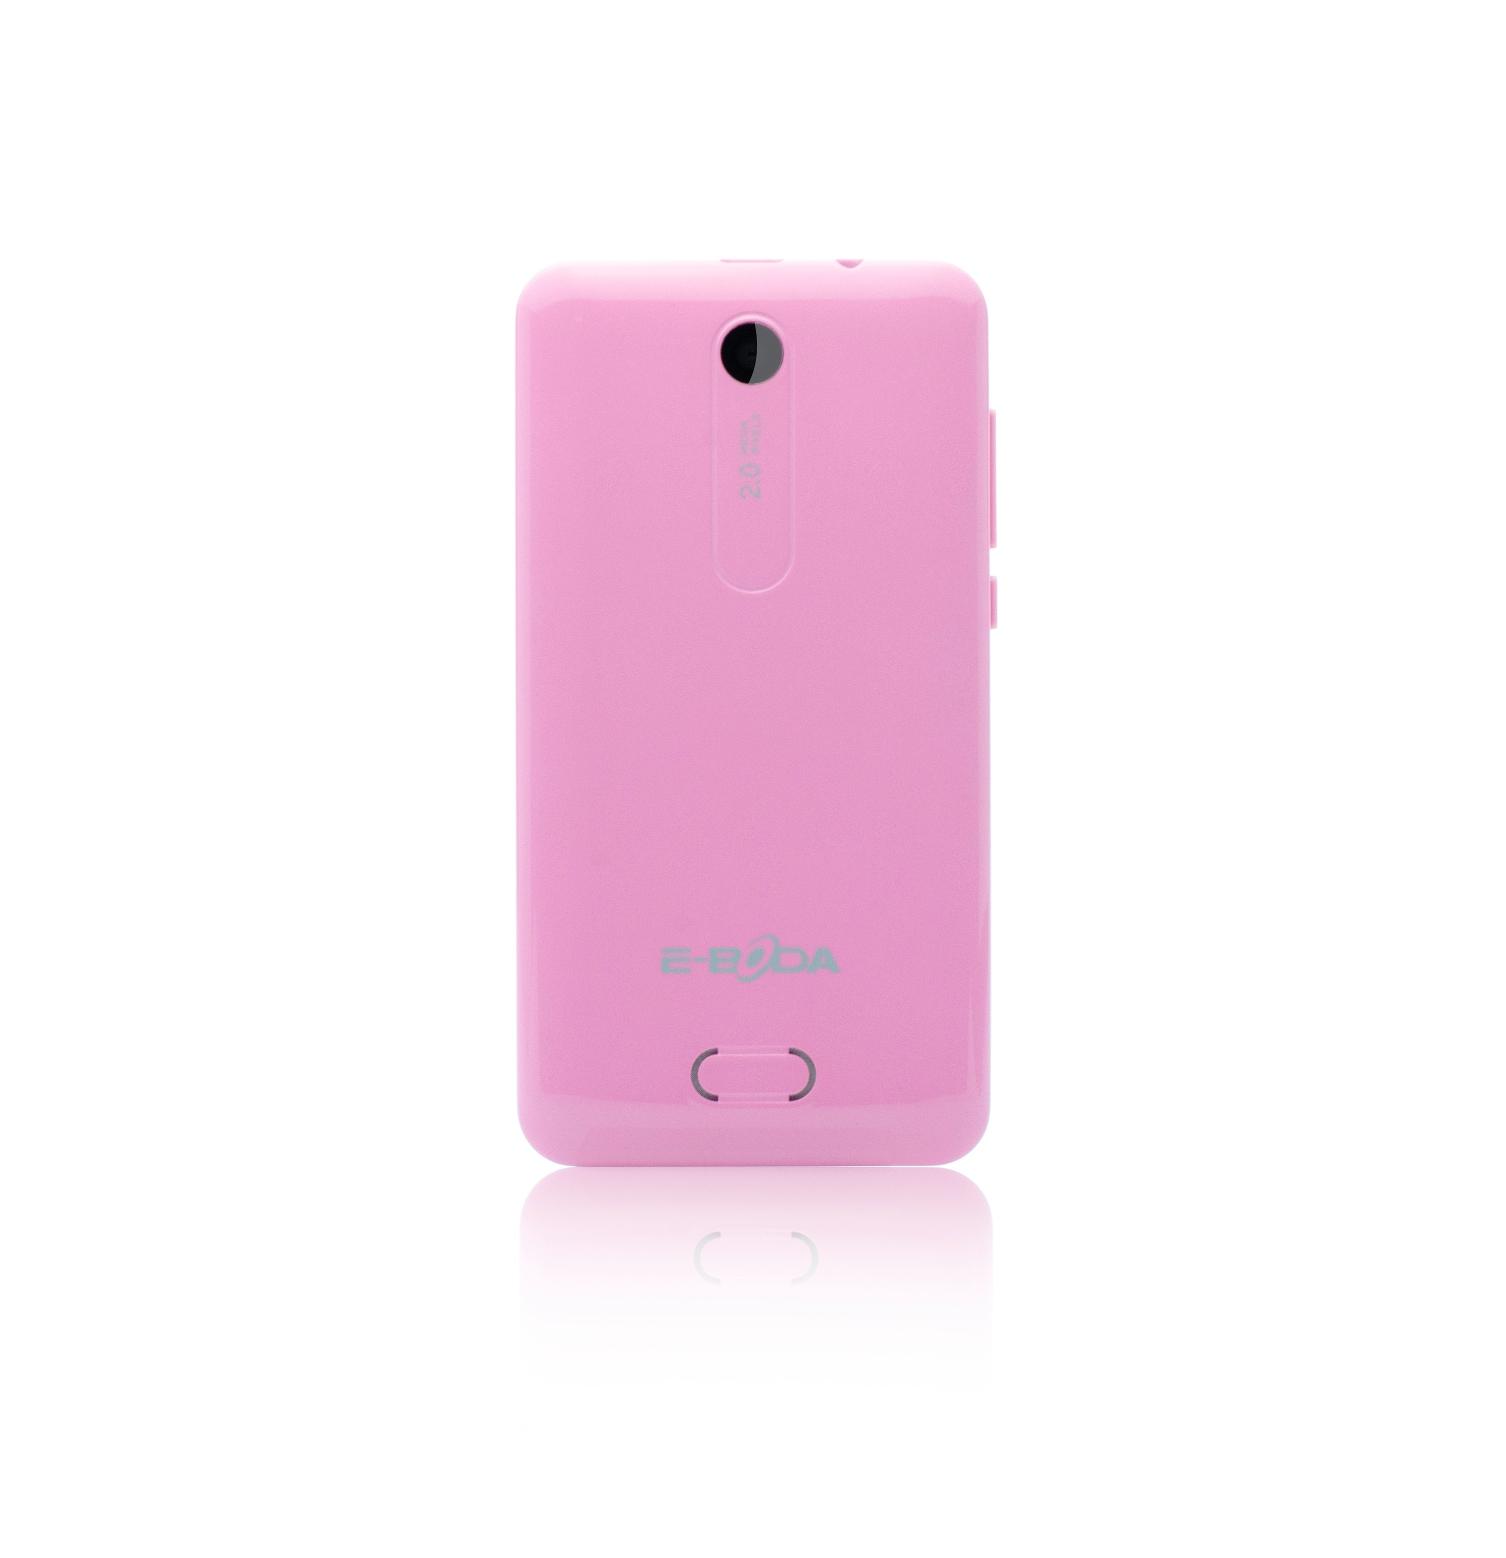 V36 Spate Roz pe alb